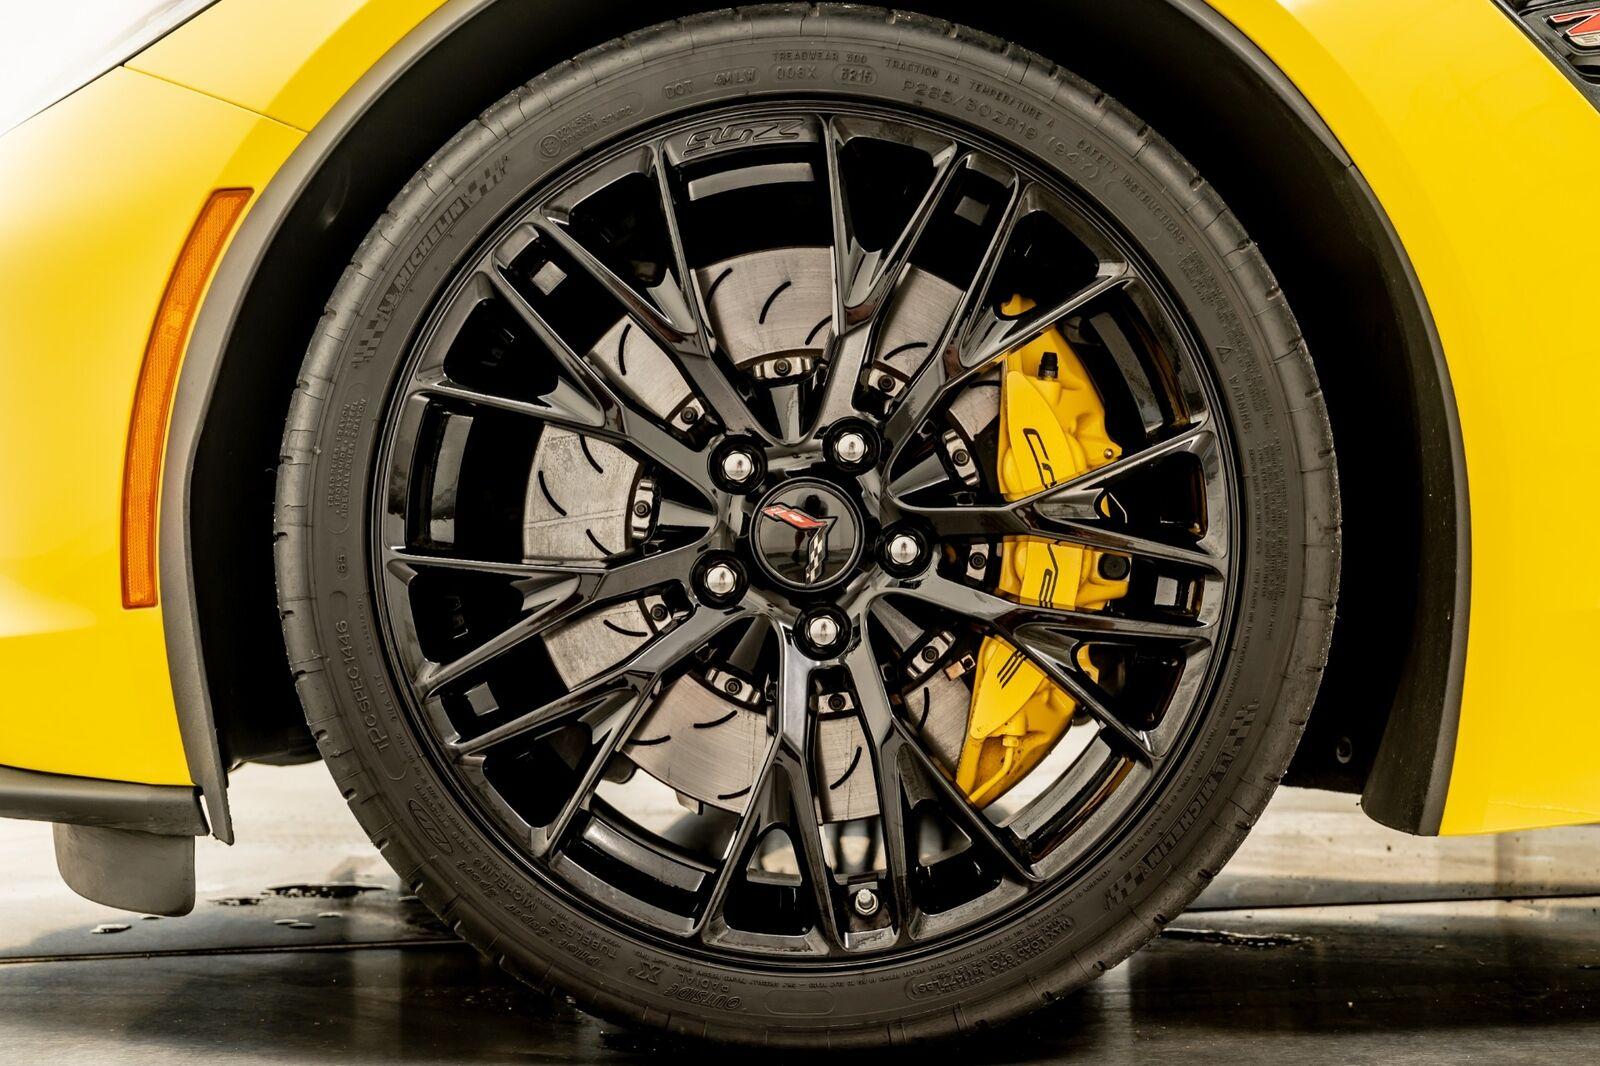 2016 Yellow Chevrolet Corvette Z06  | C7 Corvette Photo 9